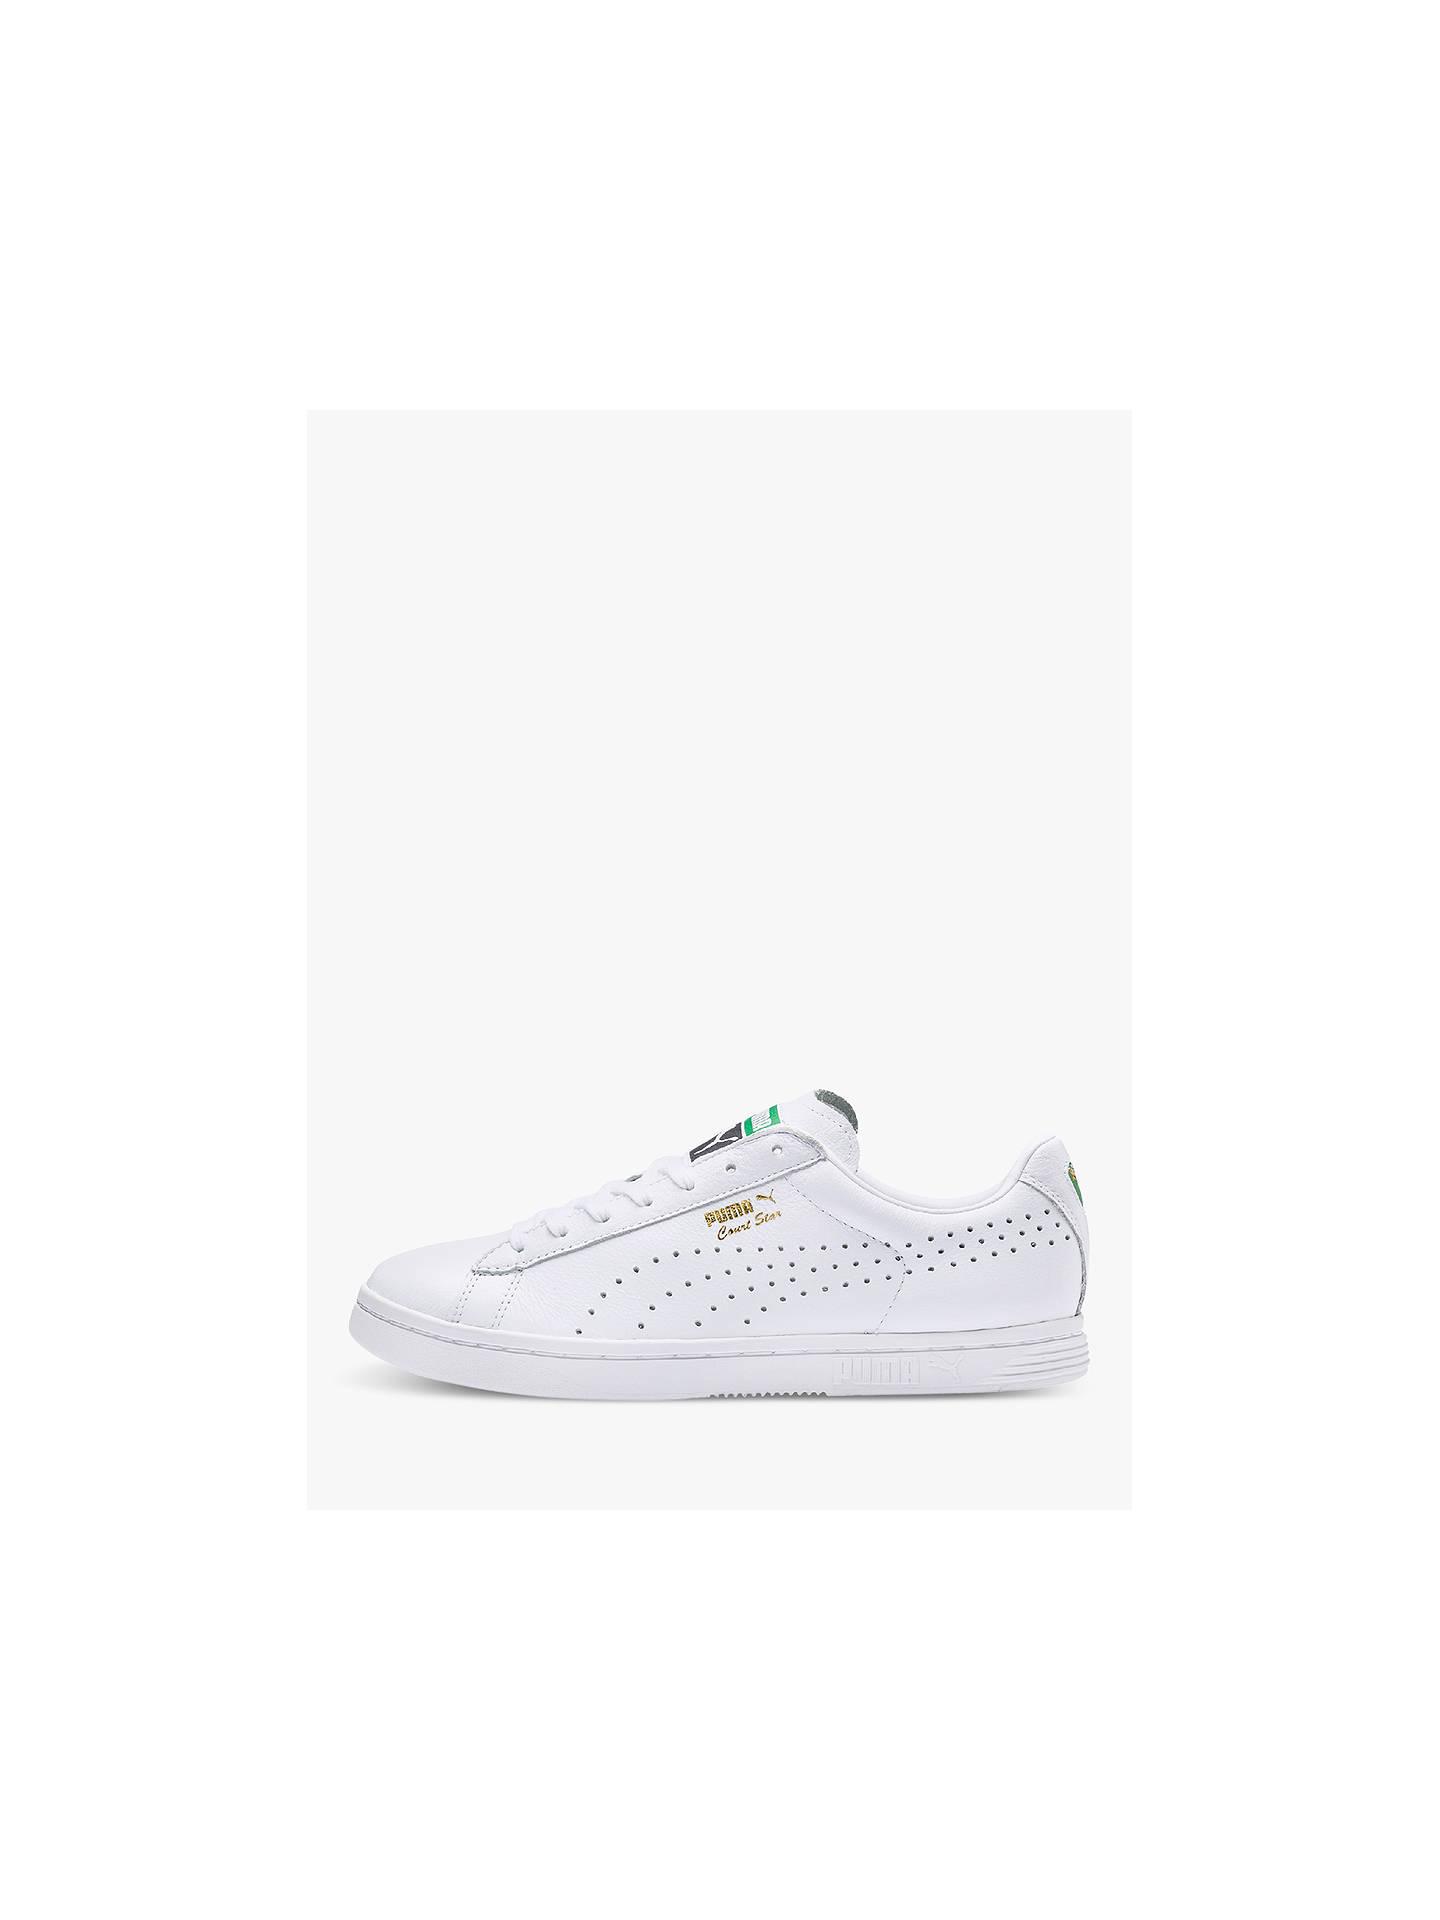 separation shoes 098da 5b09d PUMA Court Star Men's Trainers, White